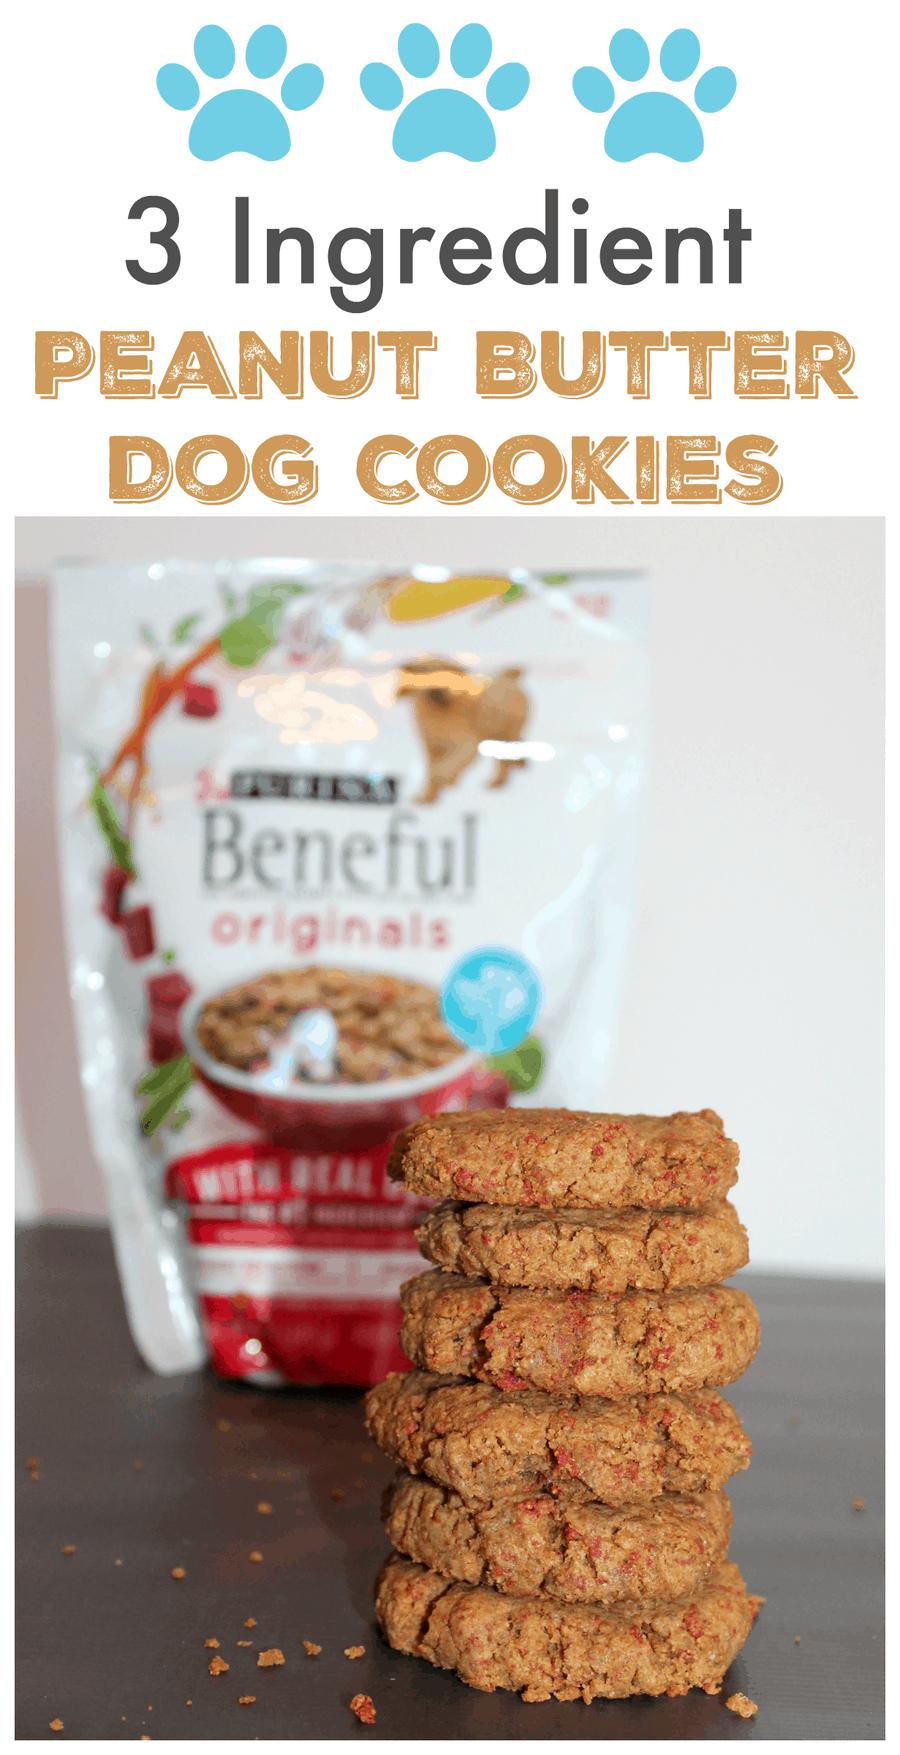 3 Ingredient Dog Cookies